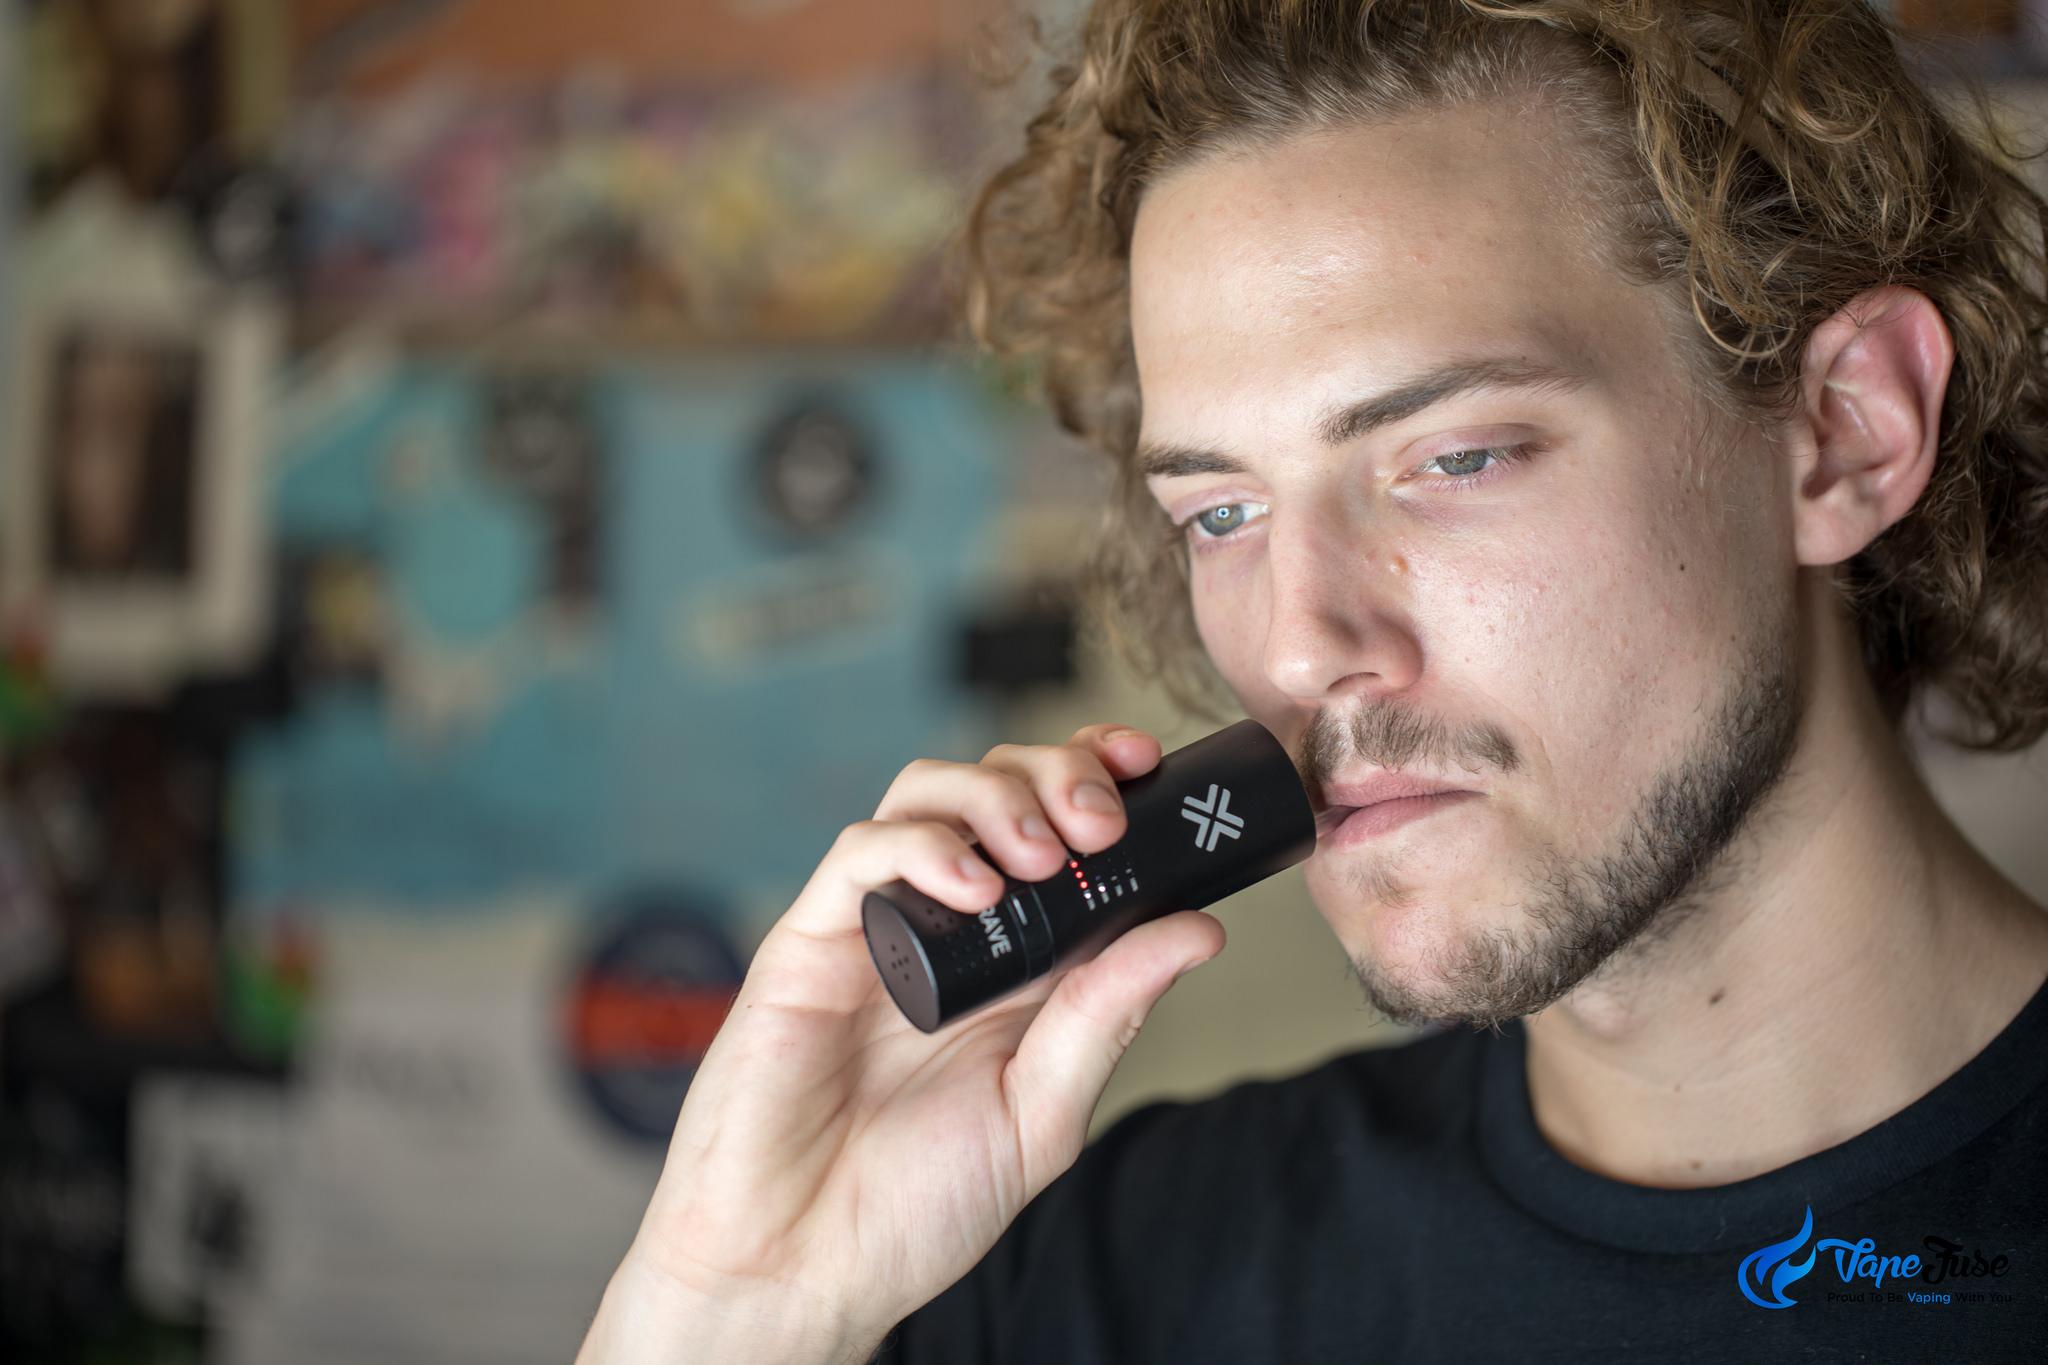 Crave Cloud Portable Vape: VapeFuse Exclusive First Review [VIDEO]